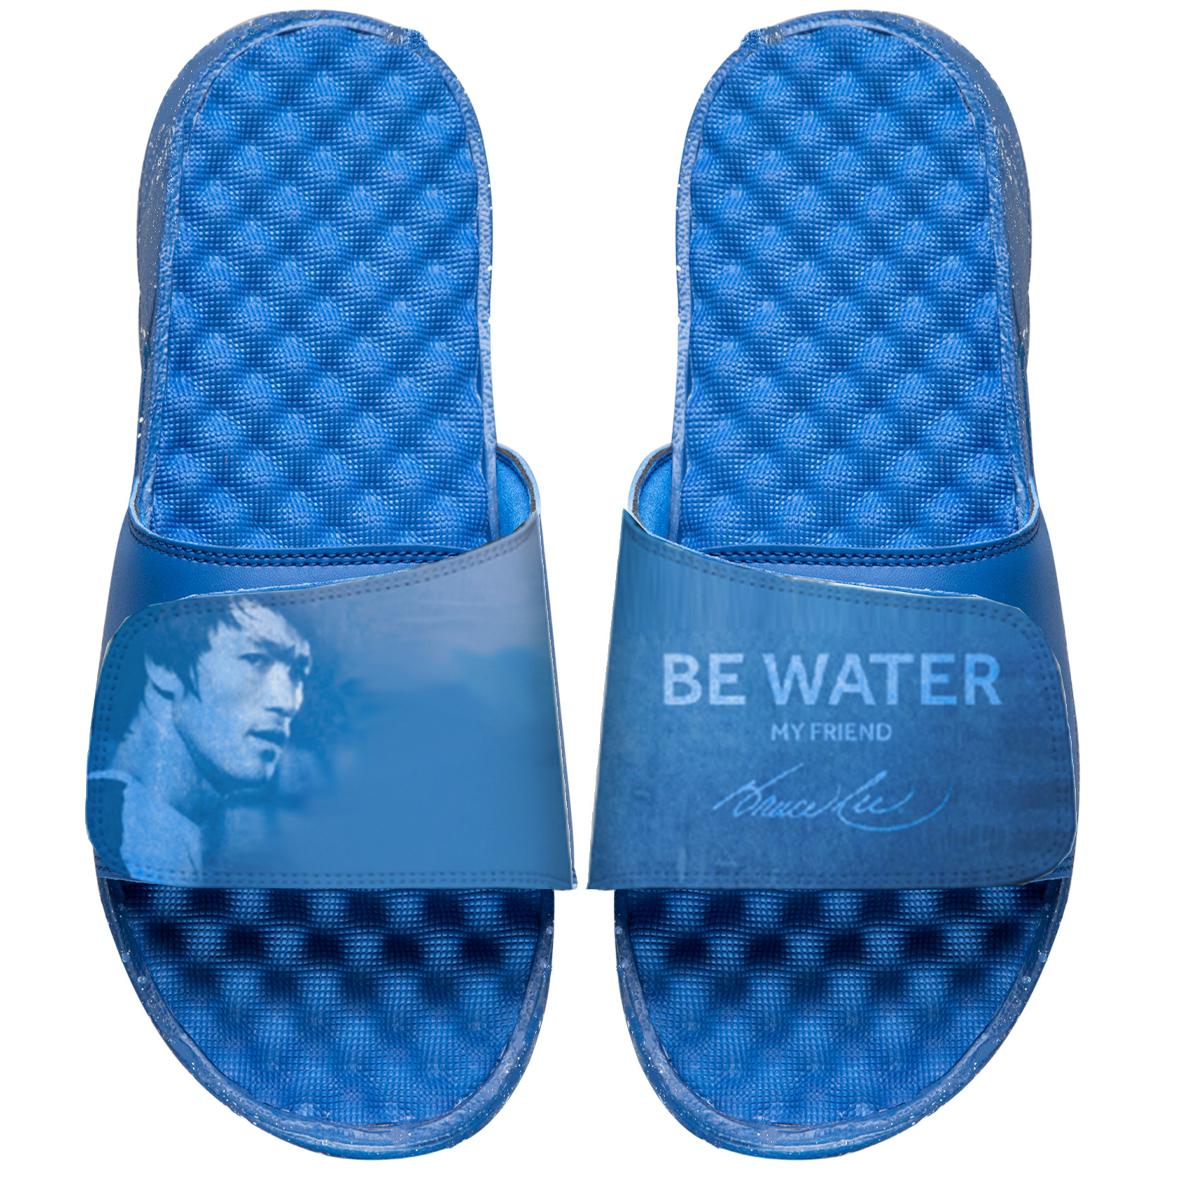 Be Water, My Friend Slides